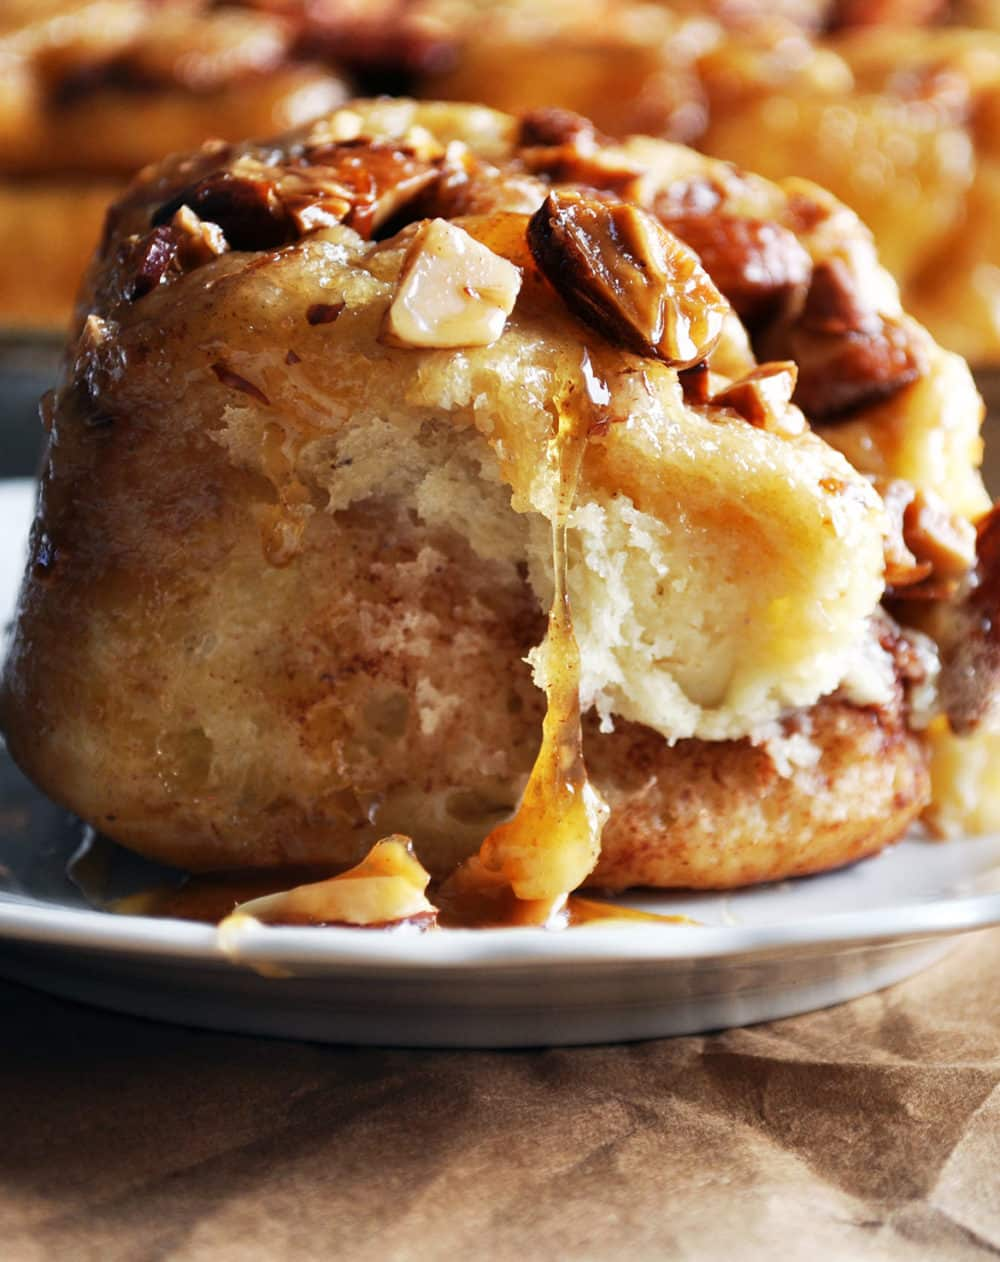 Homemade Overnight Sticky Buns | Caramel Rolls | ofbatteranddough.com